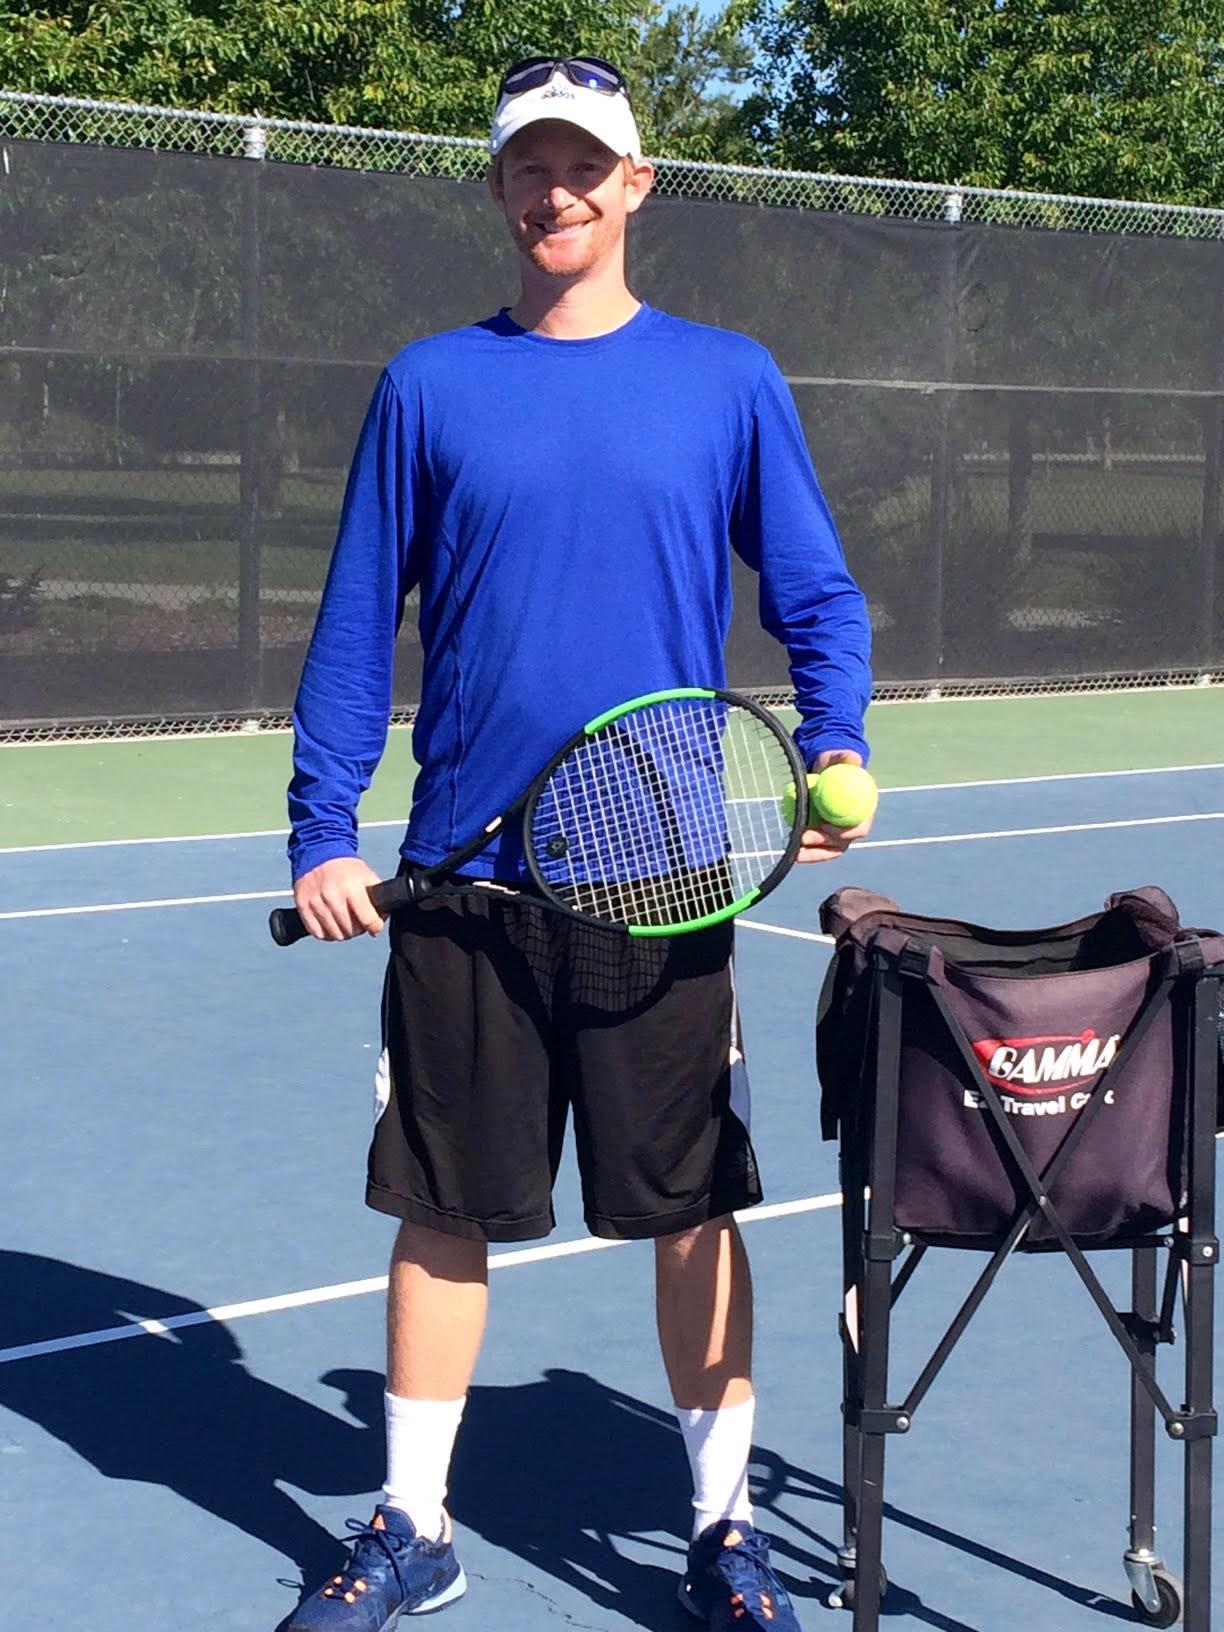 Cole S. teaches tennis lessons in Sacramento, CA